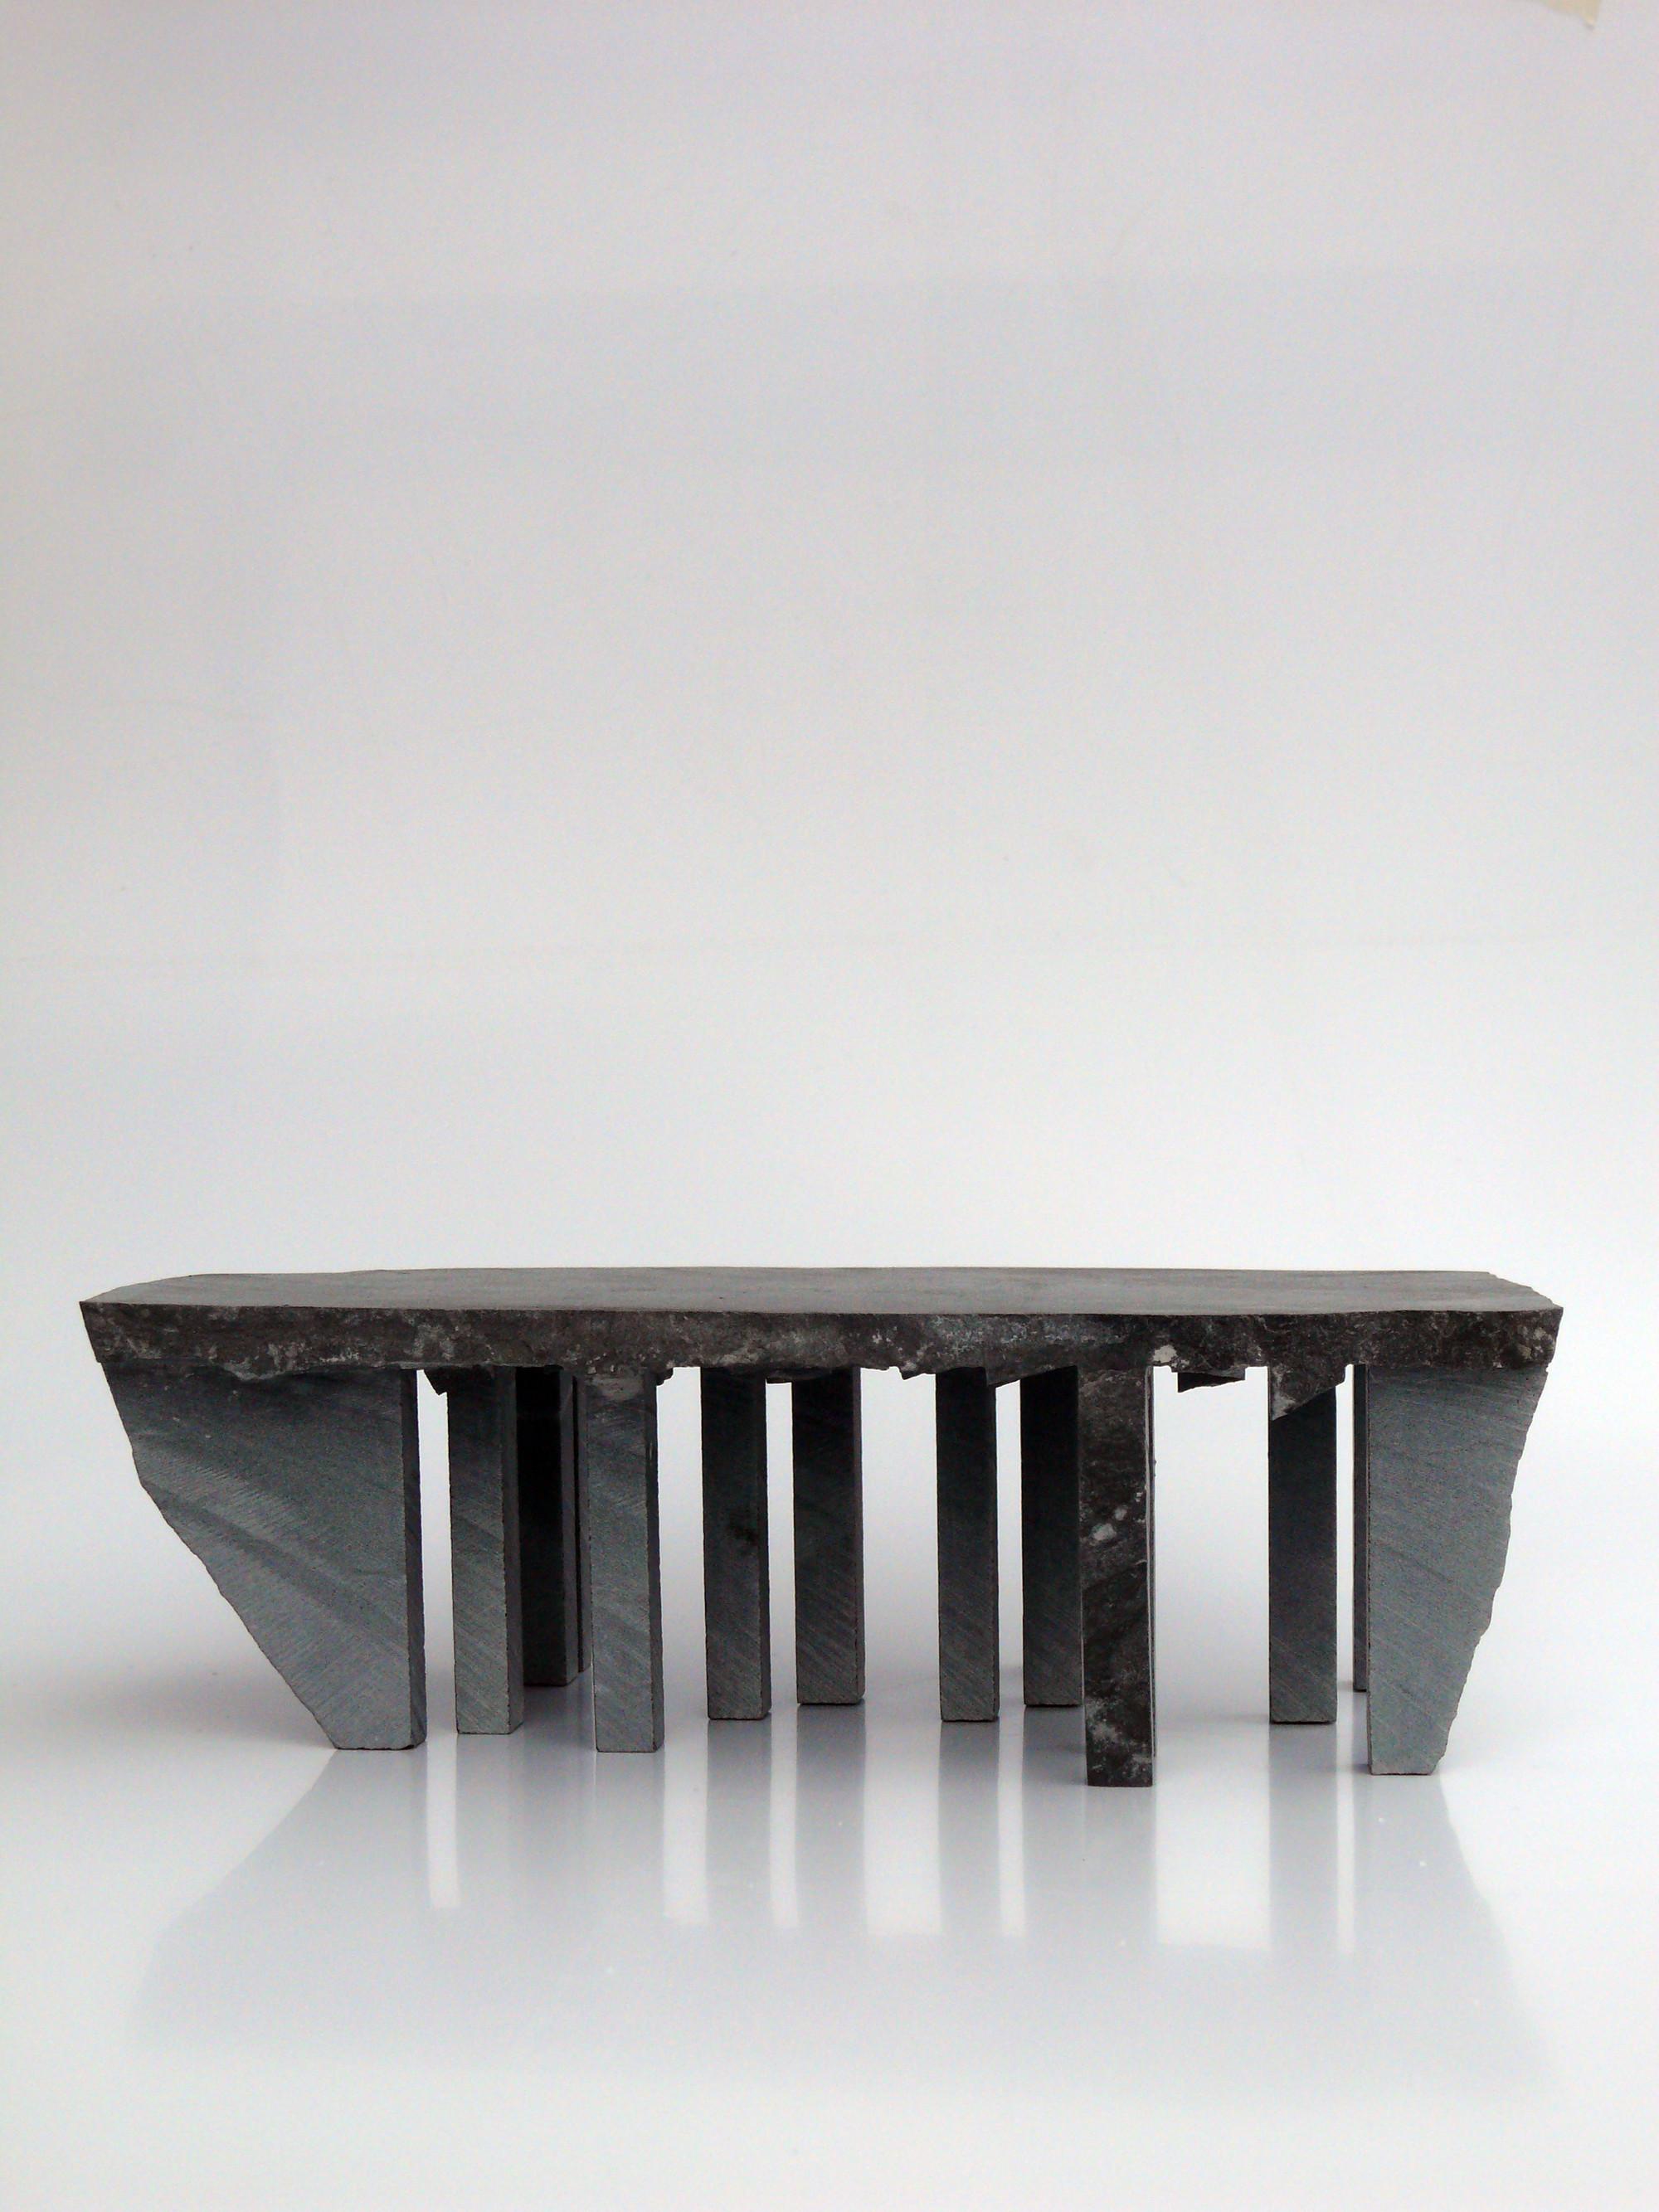 Mesa Stone and Industry / Lex Pott, Cortesia de Lex Pott